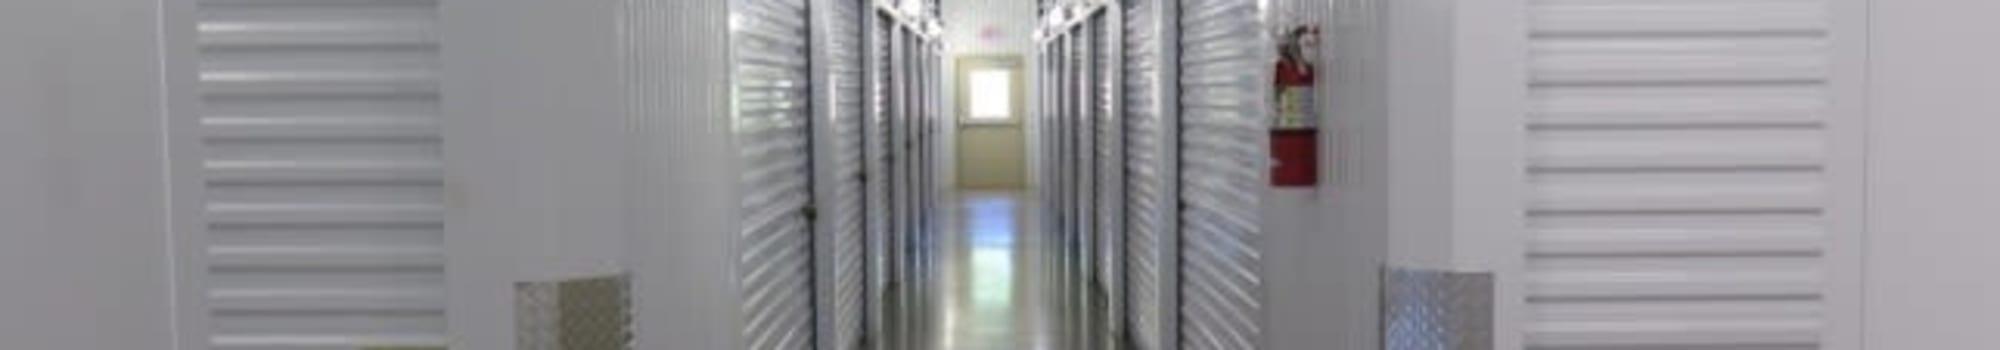 Self storage at Ranch Road Self Storage in San Marcos, Texas